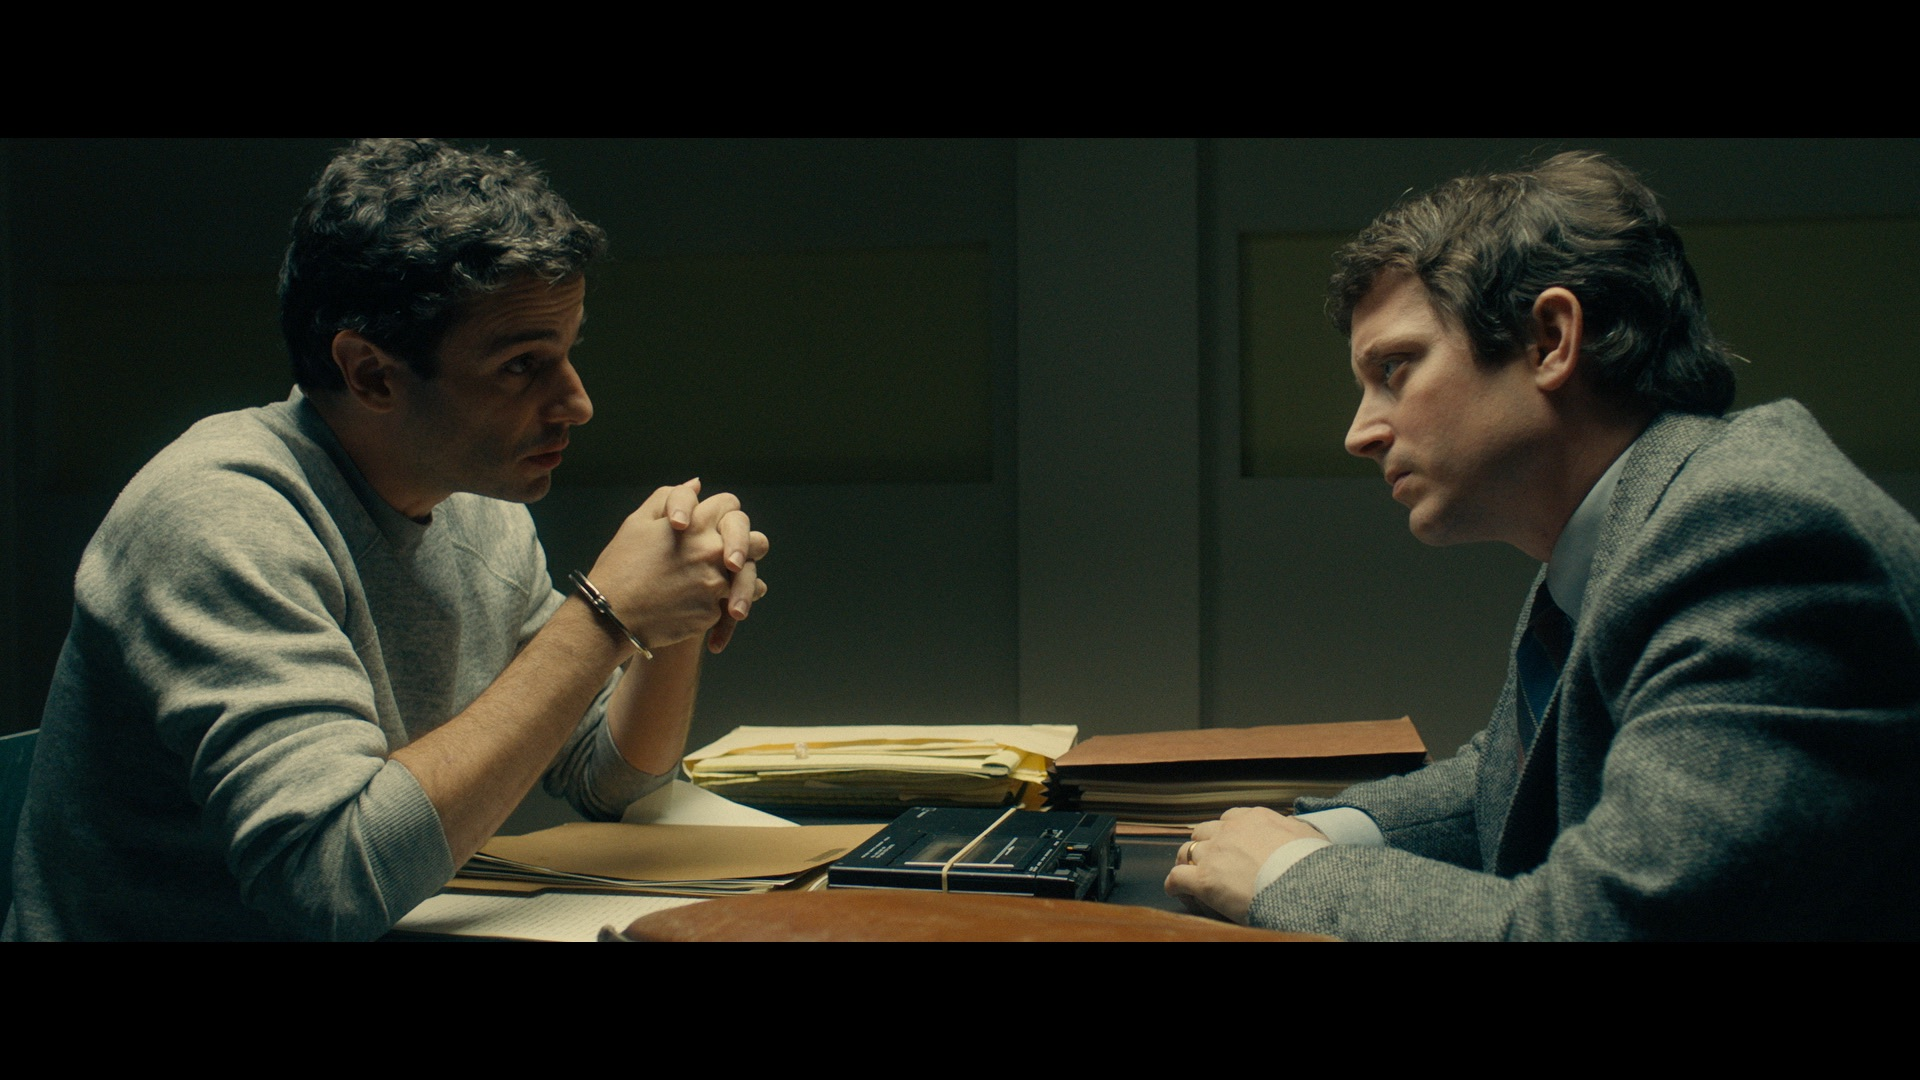 Elijah Wood, Luke Kirby and 'No Man of God' Director Amber Sealey on Exploring the Dark Soul of Ted Bundy